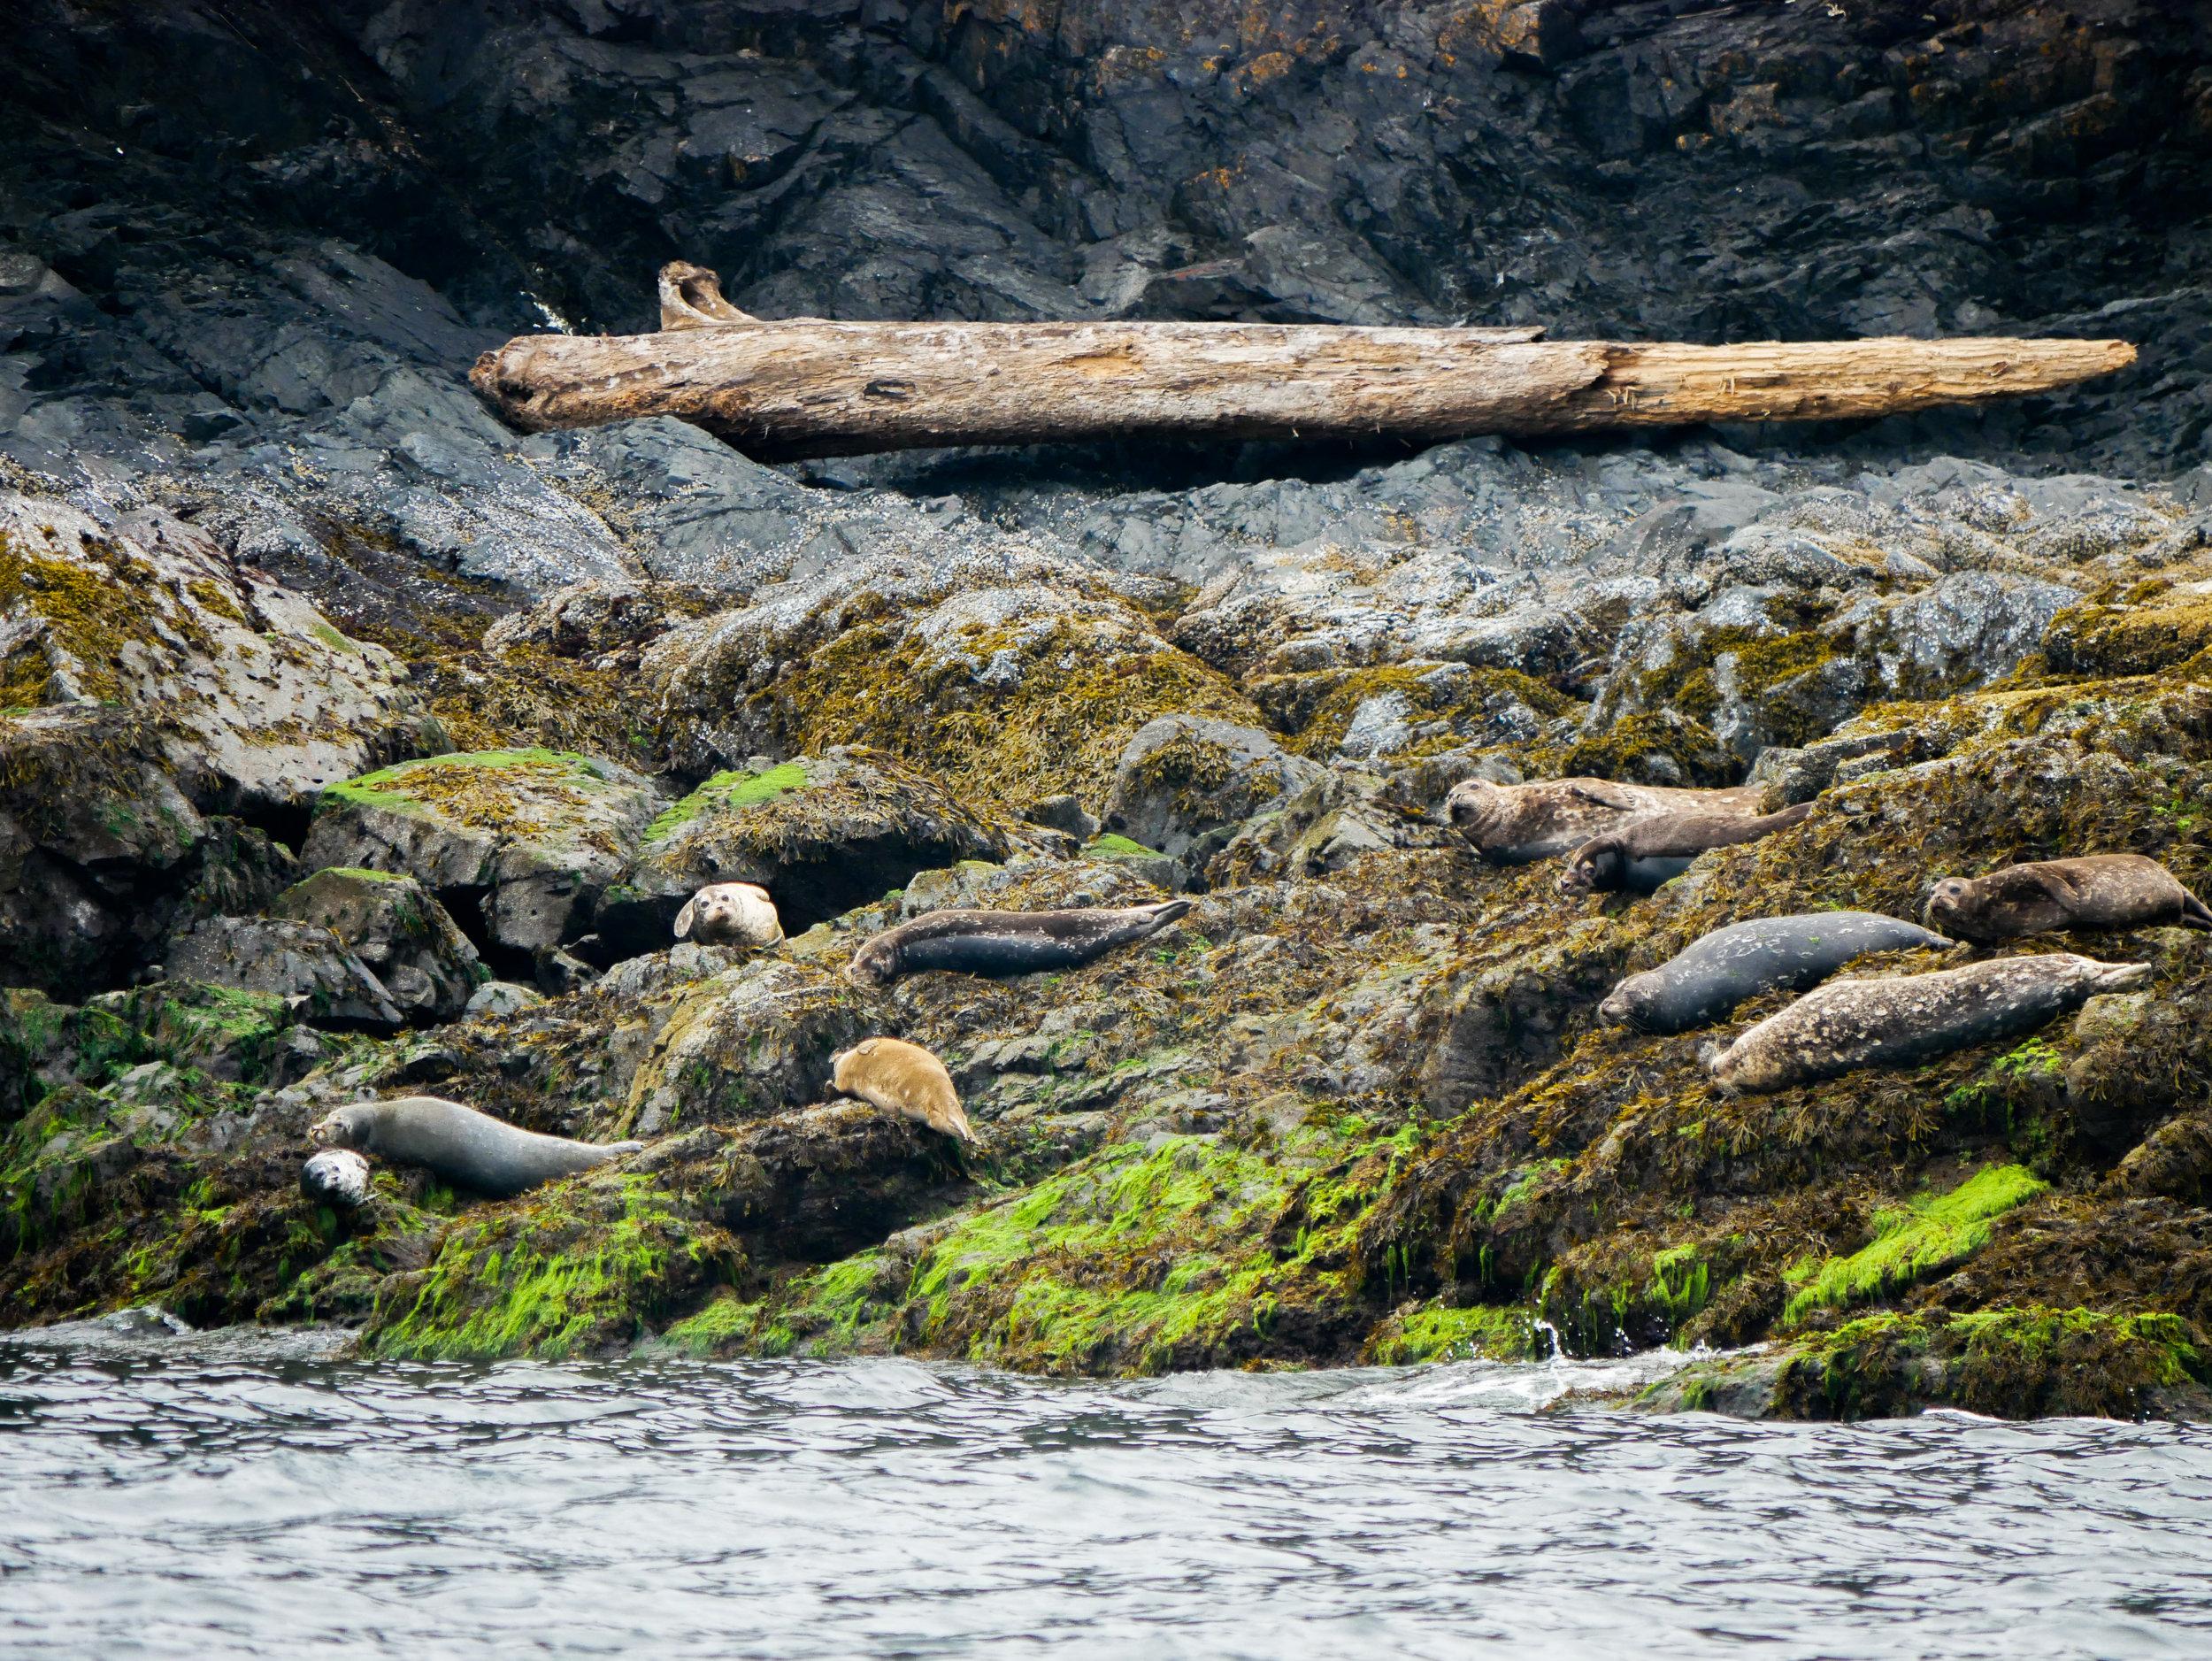 Harbour seals taking a break on the algae beds. Photo by Alanna Vivani - 10:30 tour.